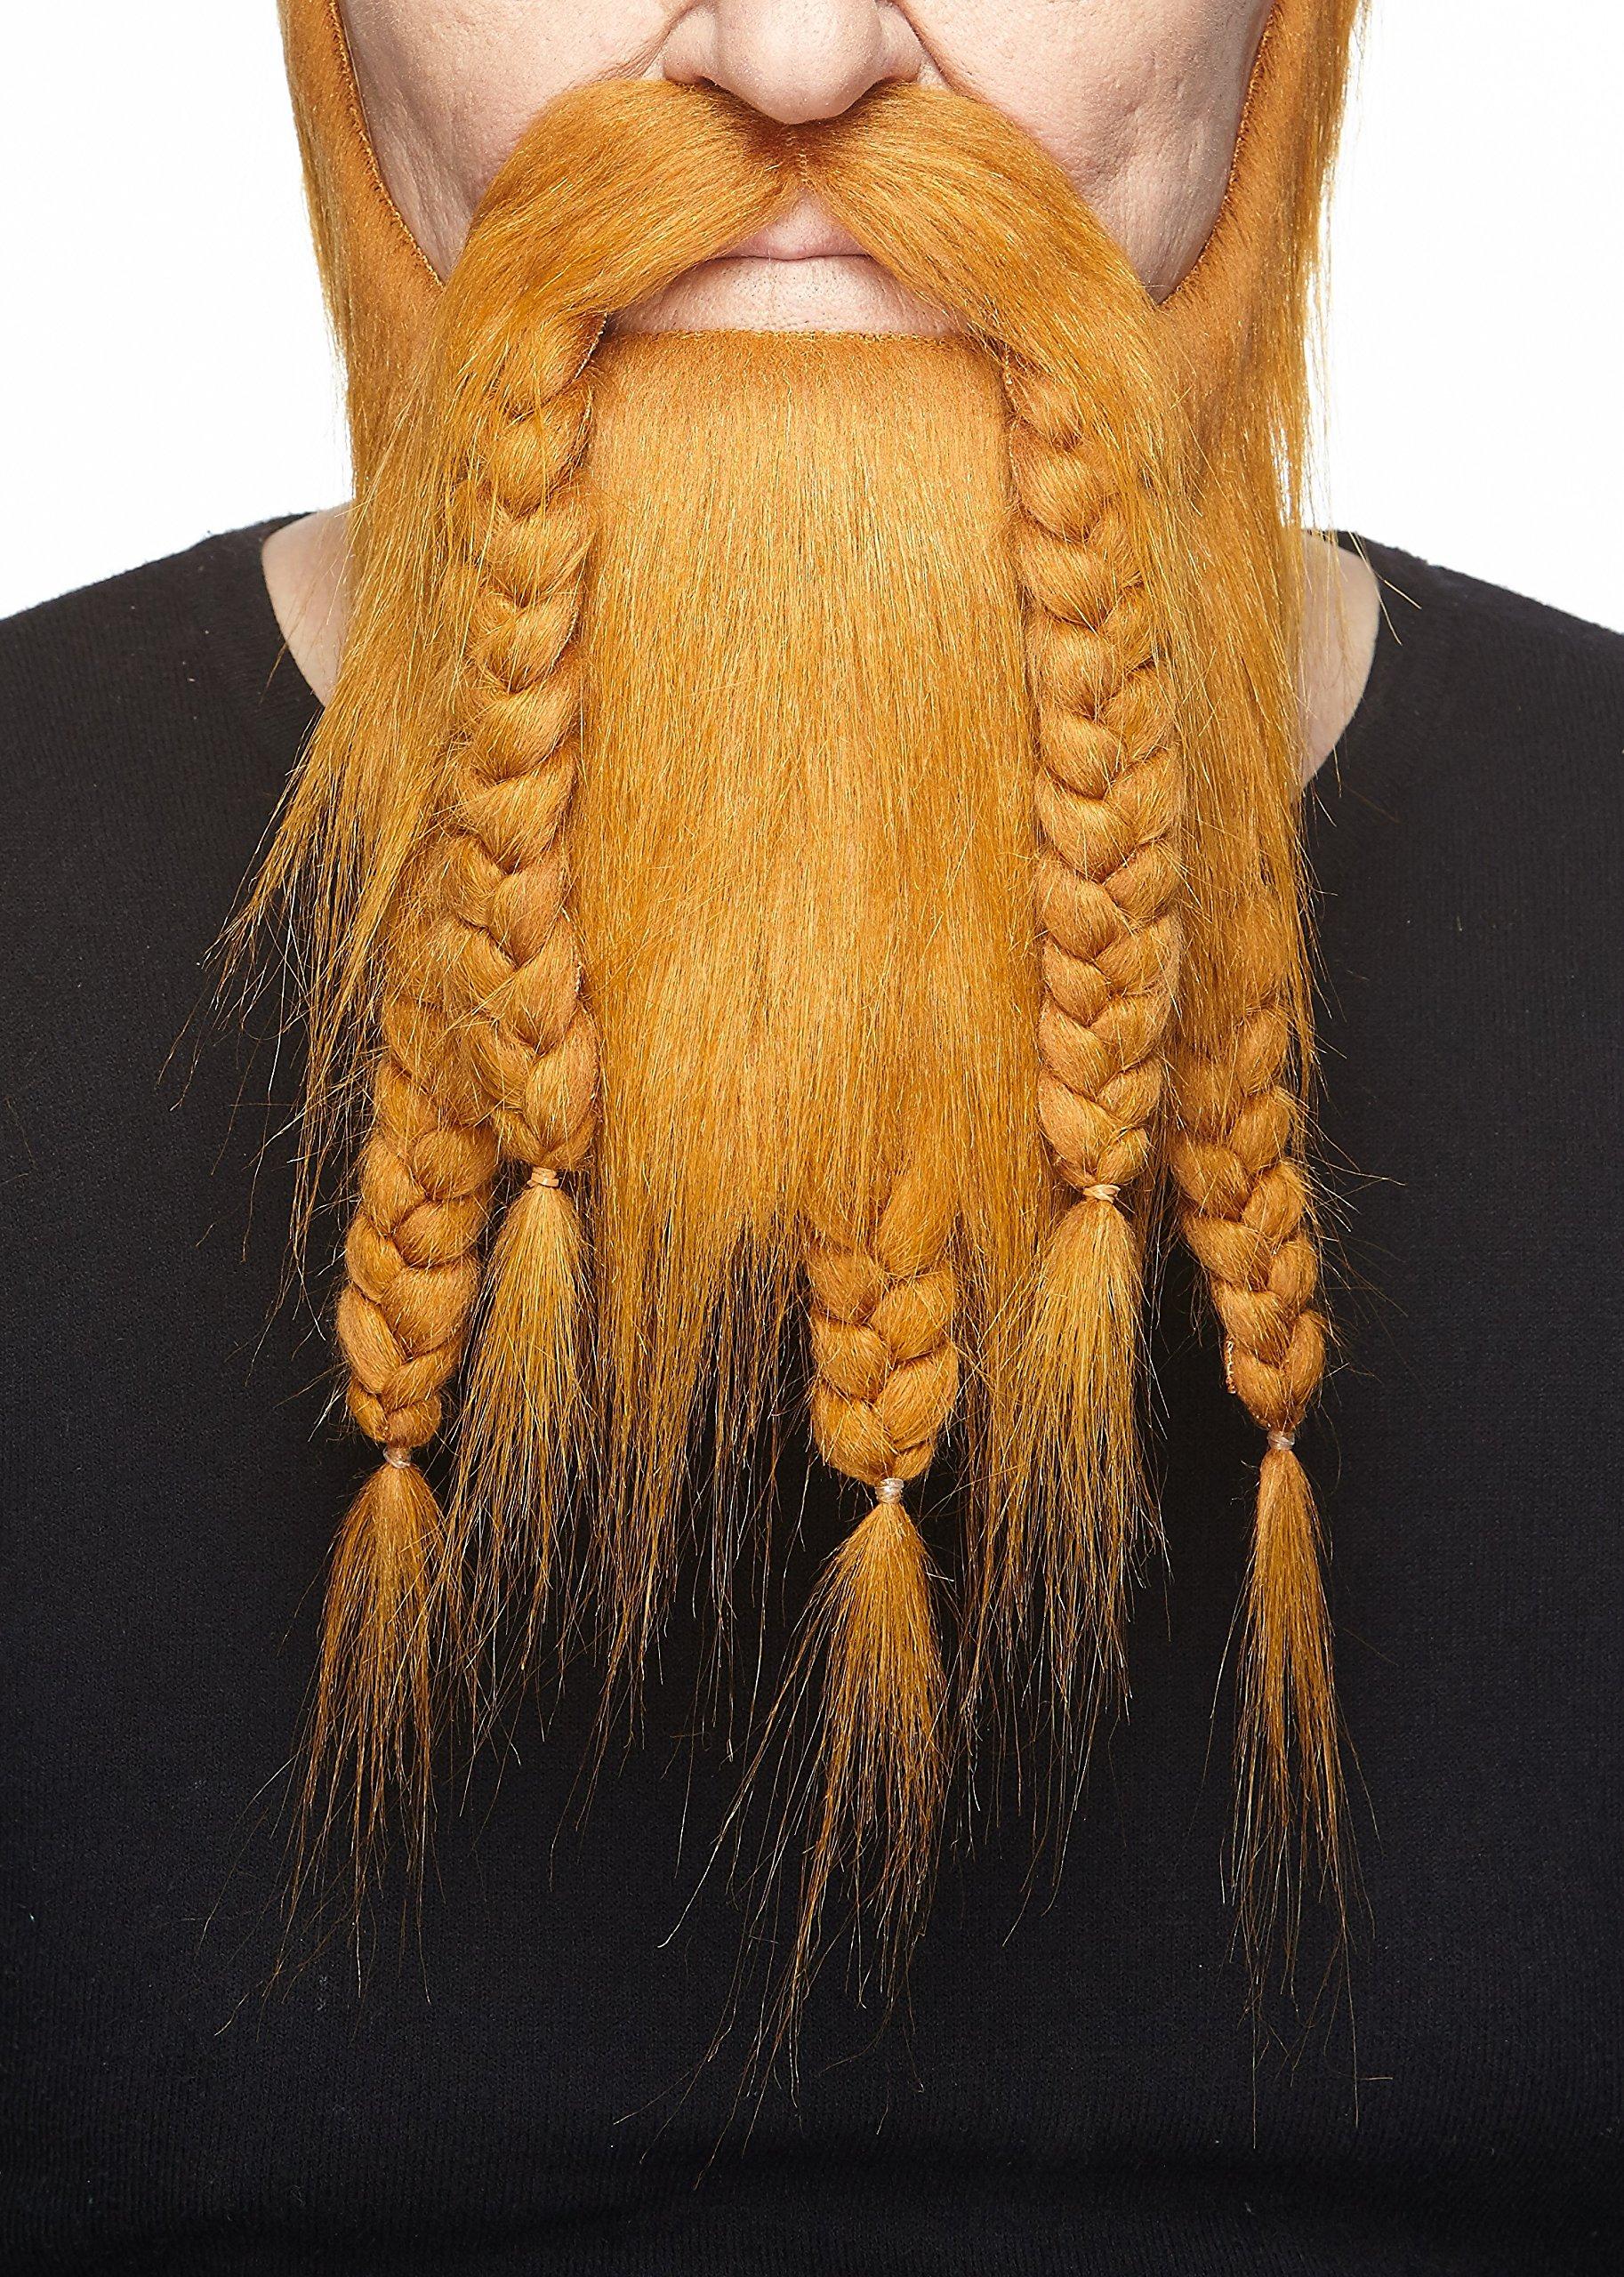 Mustaches Self Adhesive, Novelty, Fake Viking Dwarf Beard, Ginger Color